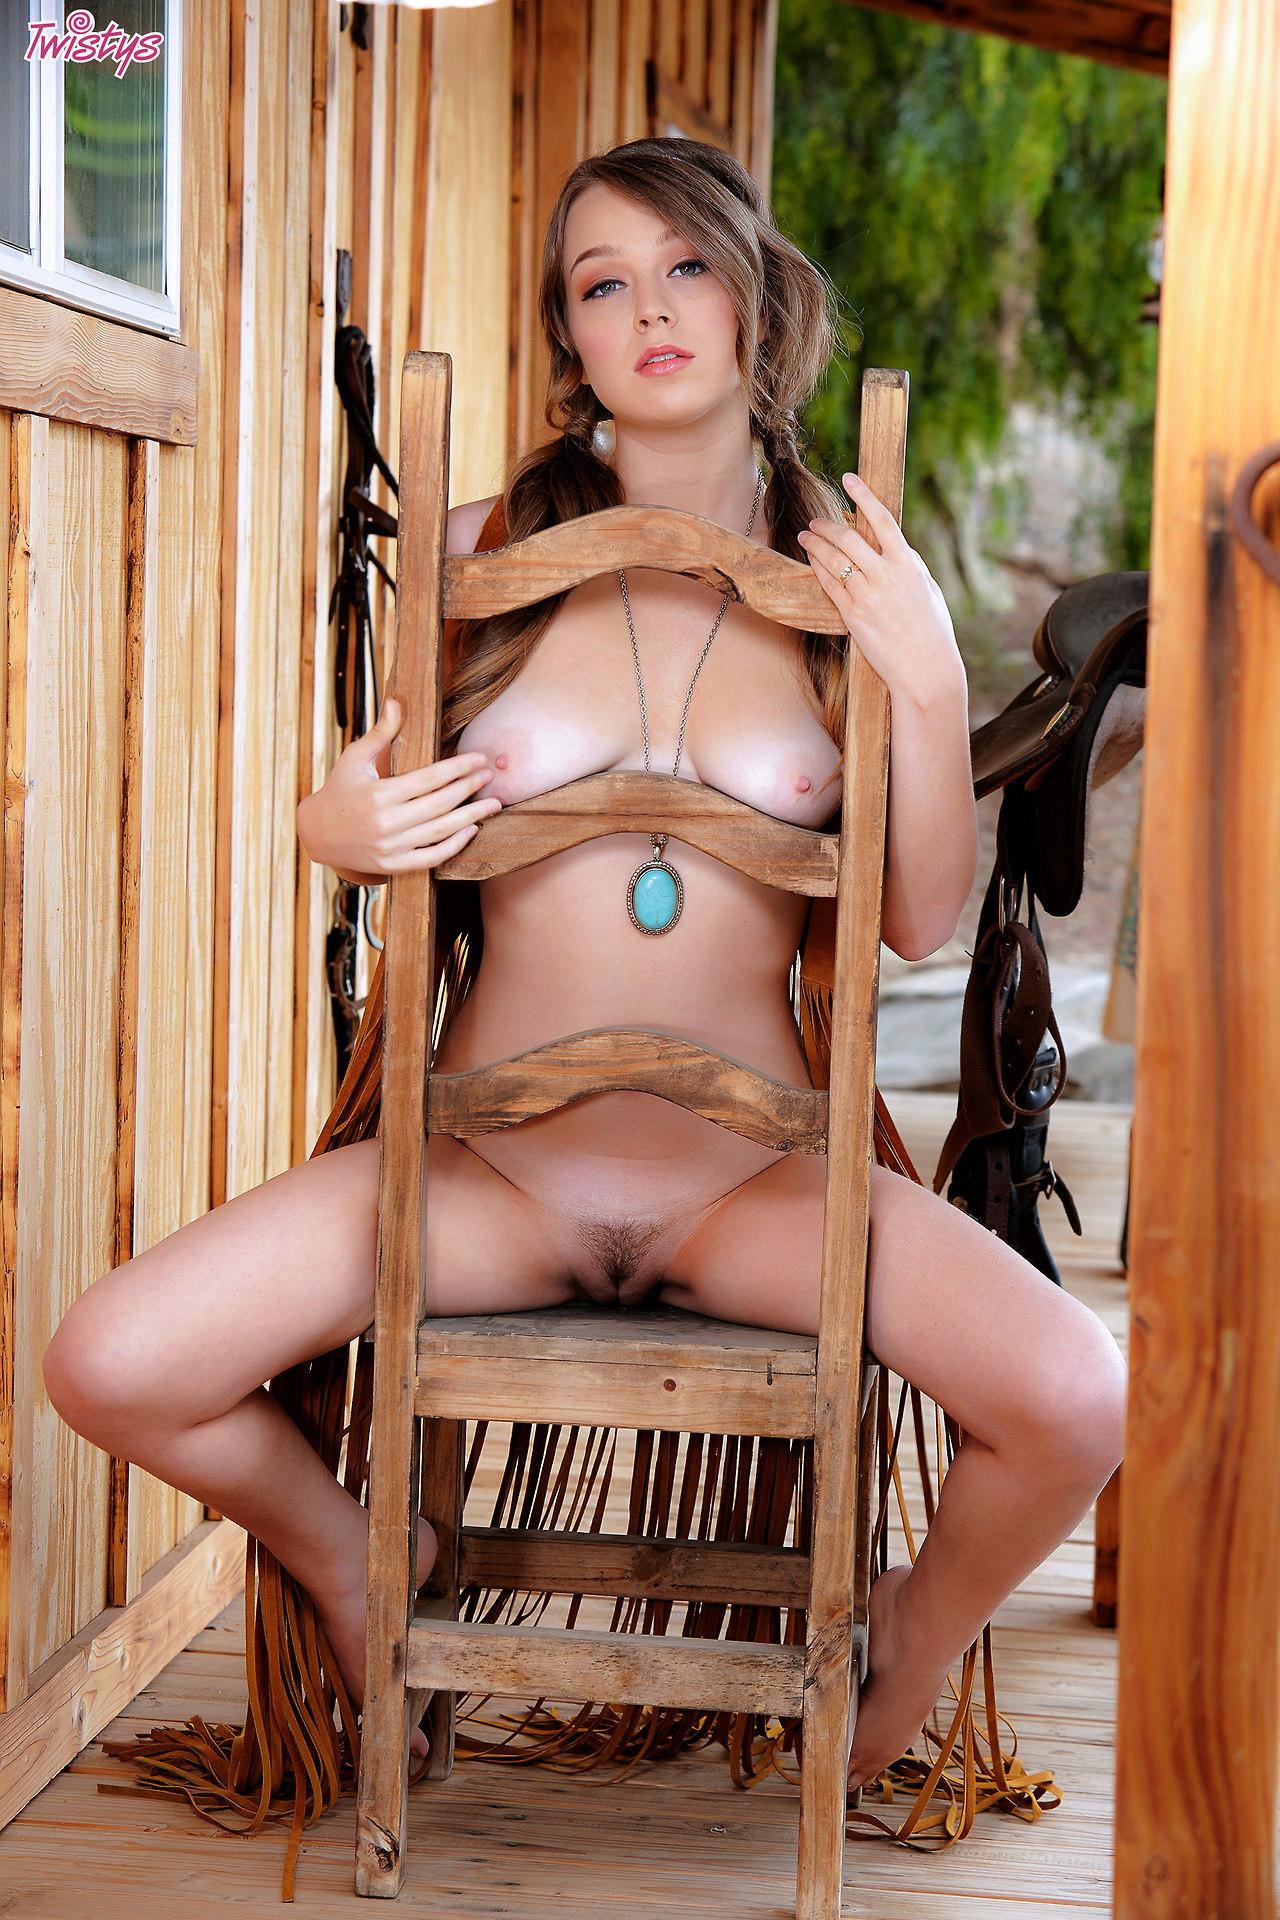 Alaina Fox – Good Ol' Usofa Girl Next Door Type The Saddle Is T , Lets Ride 10